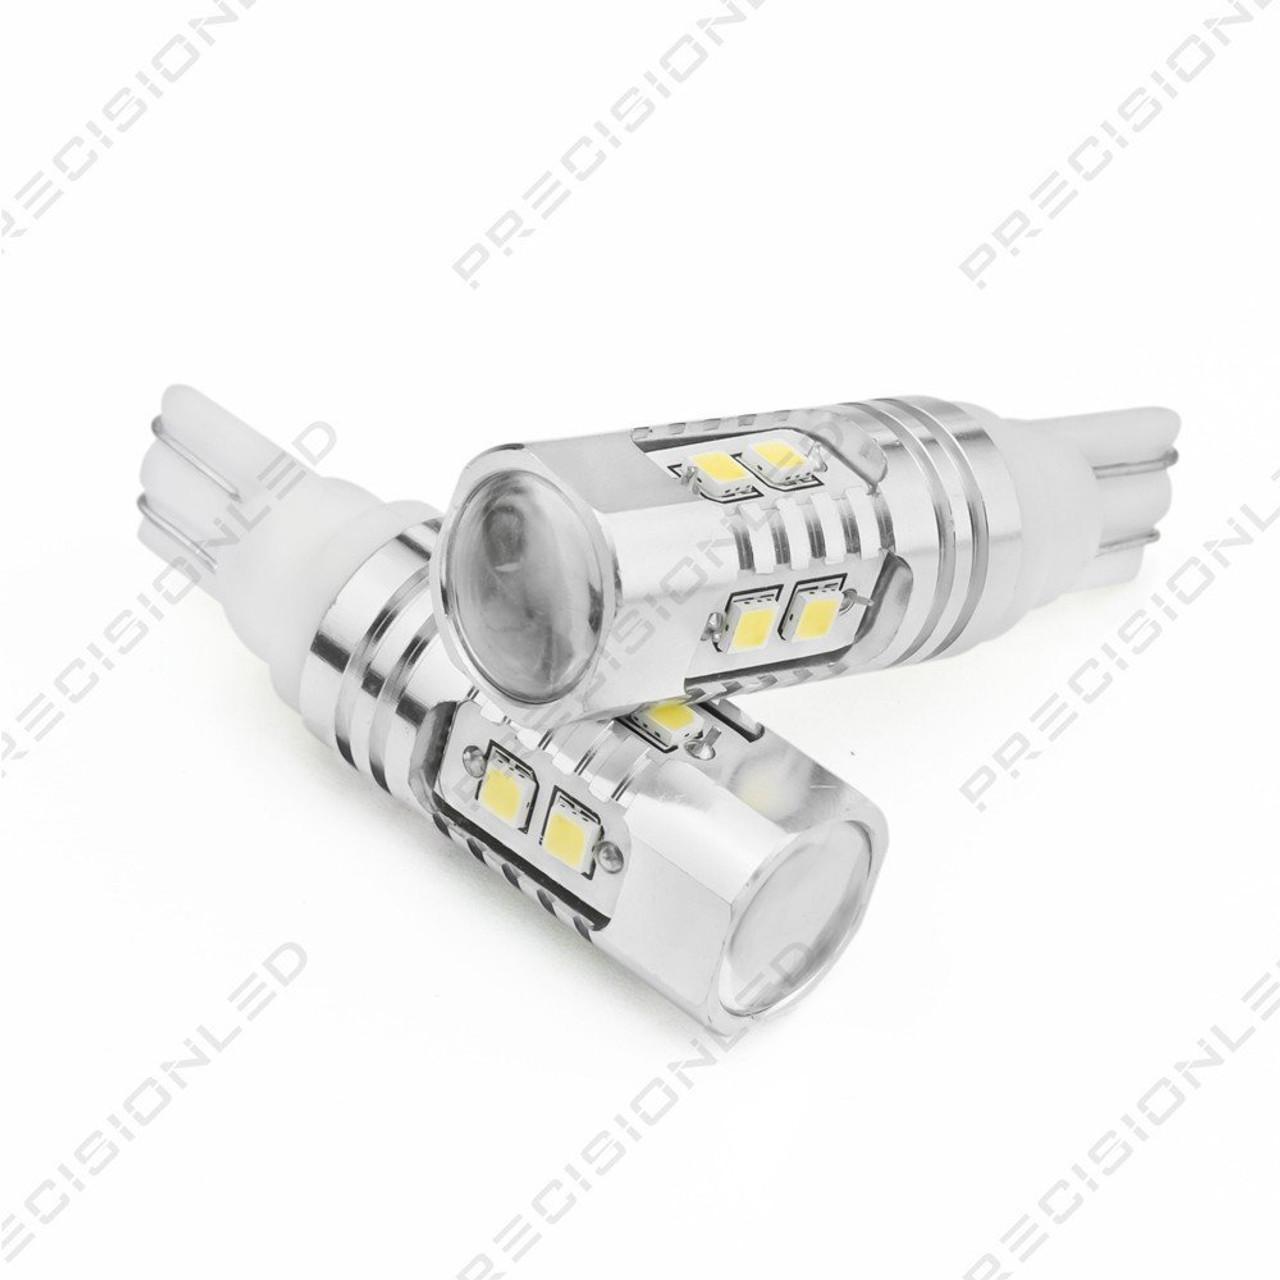 Volvo 960 LED Backup Reverse Lights (1991-1996)